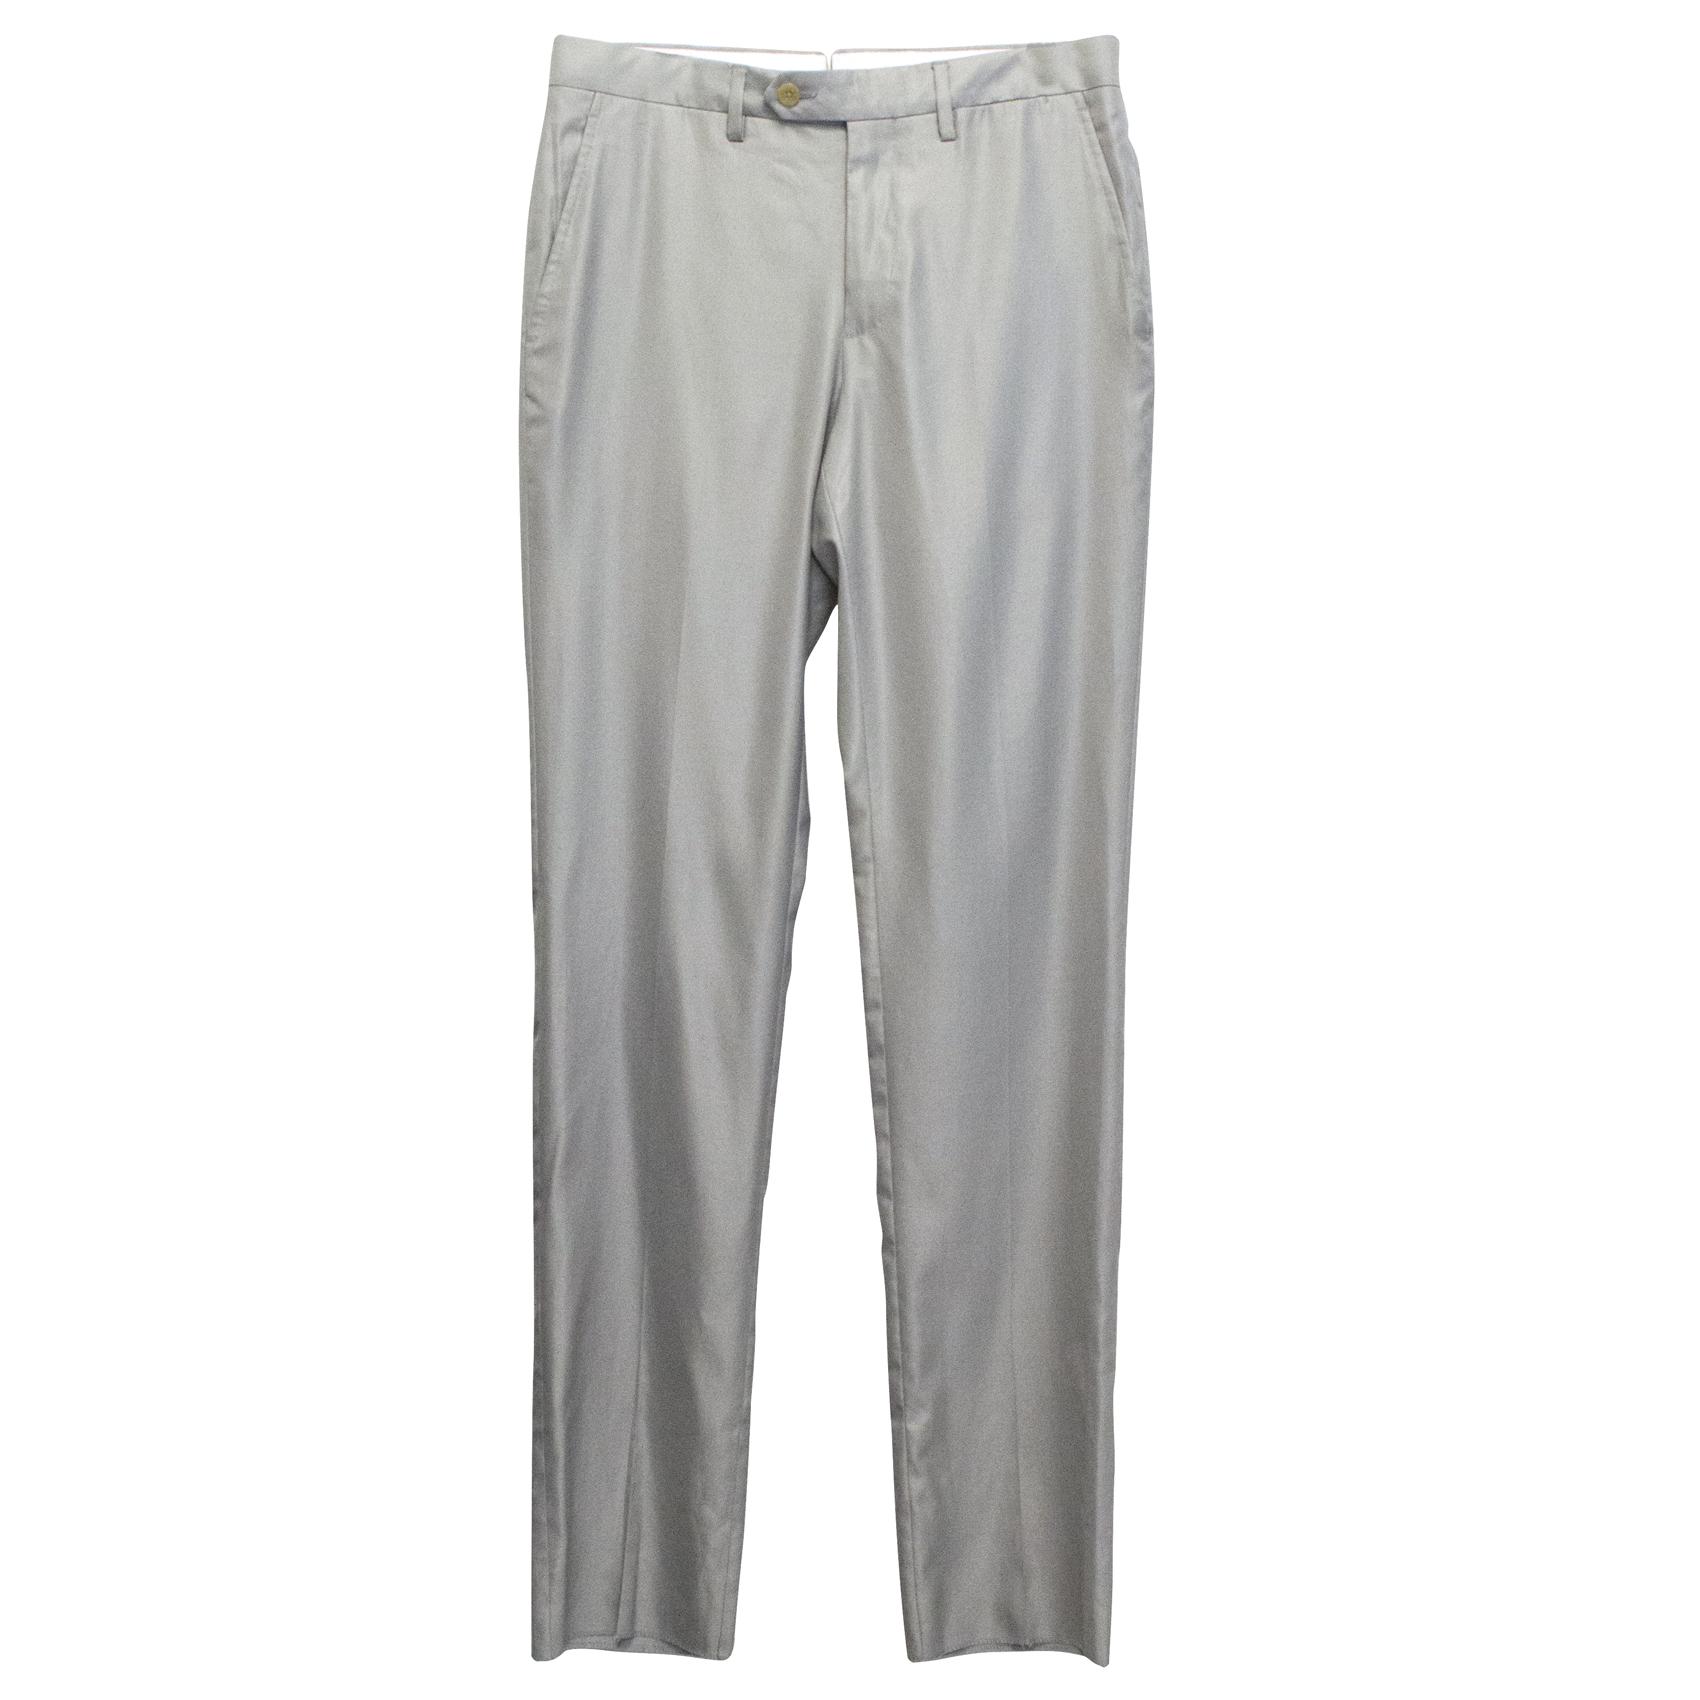 Grey Smart Trousers